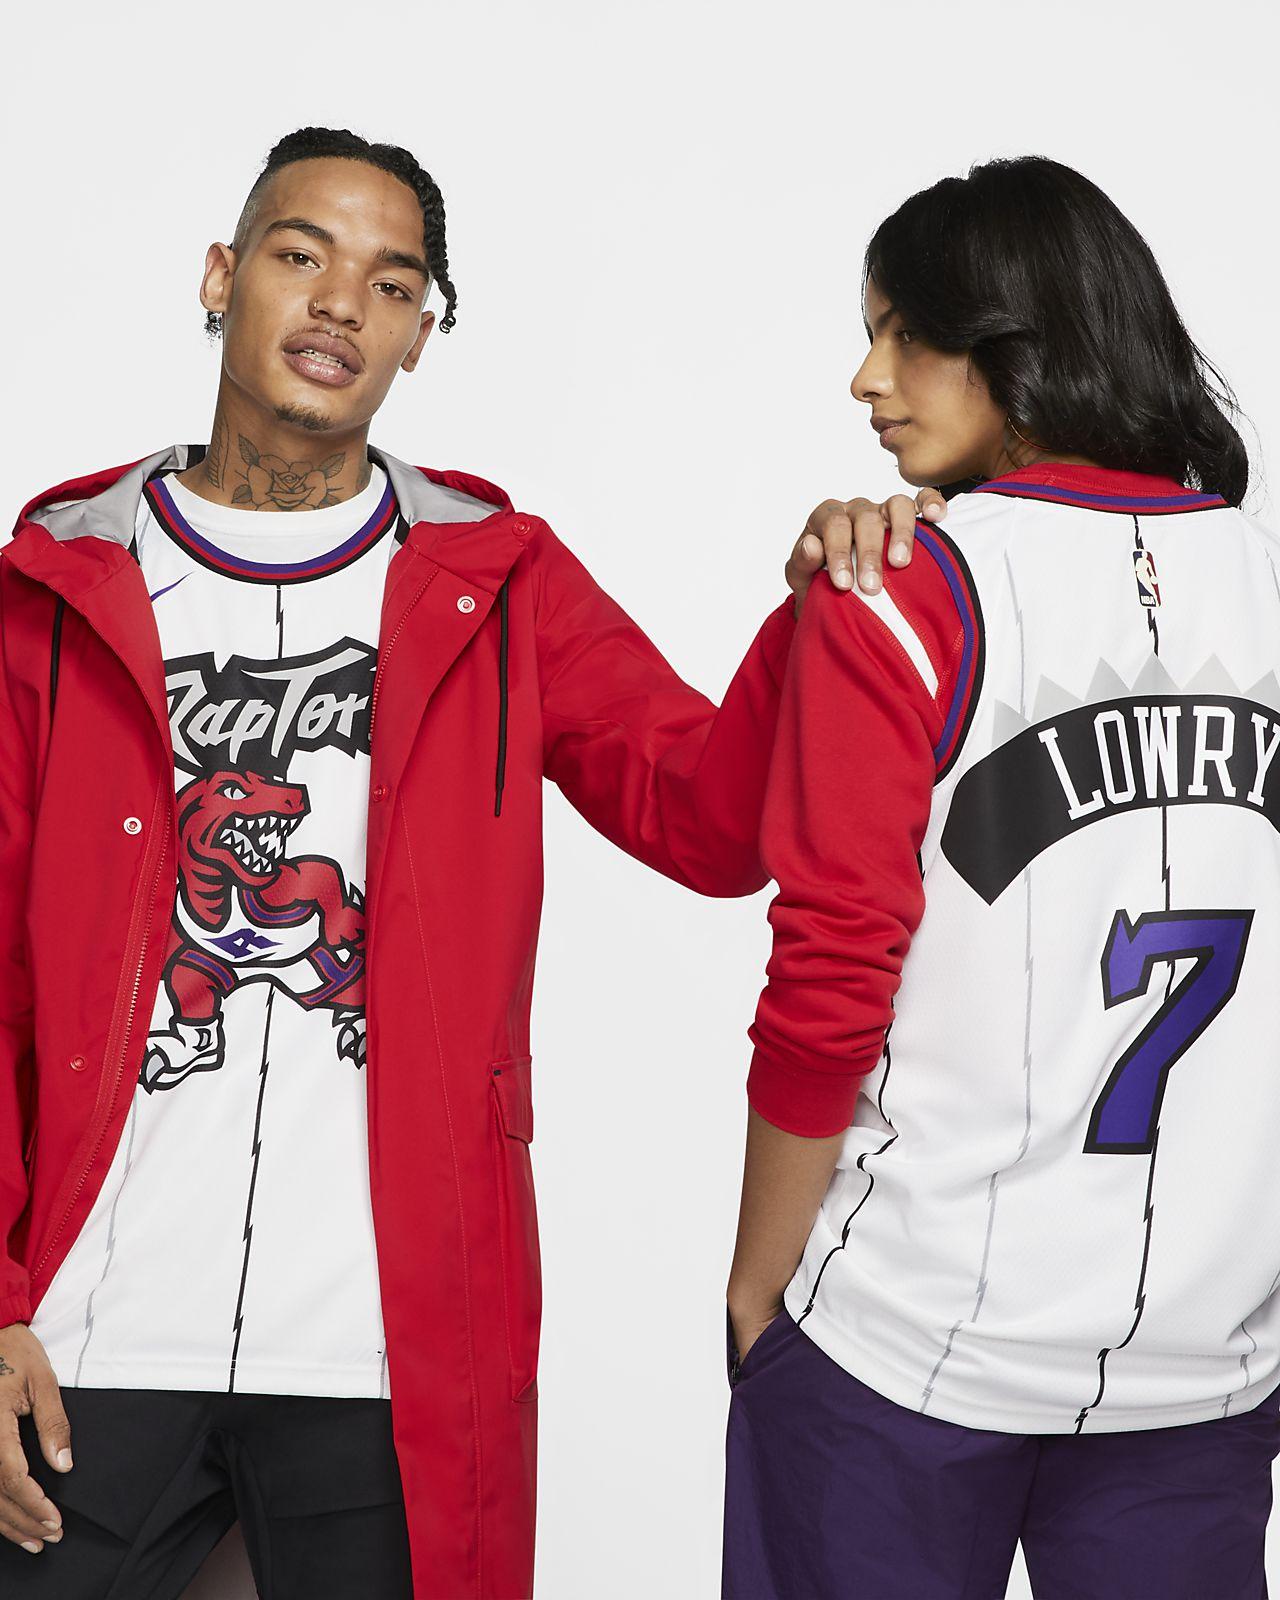 Kyle Lowry Classic Edition Swingman (Toronto Raptors) Men's Nike NBA Connected Jersey